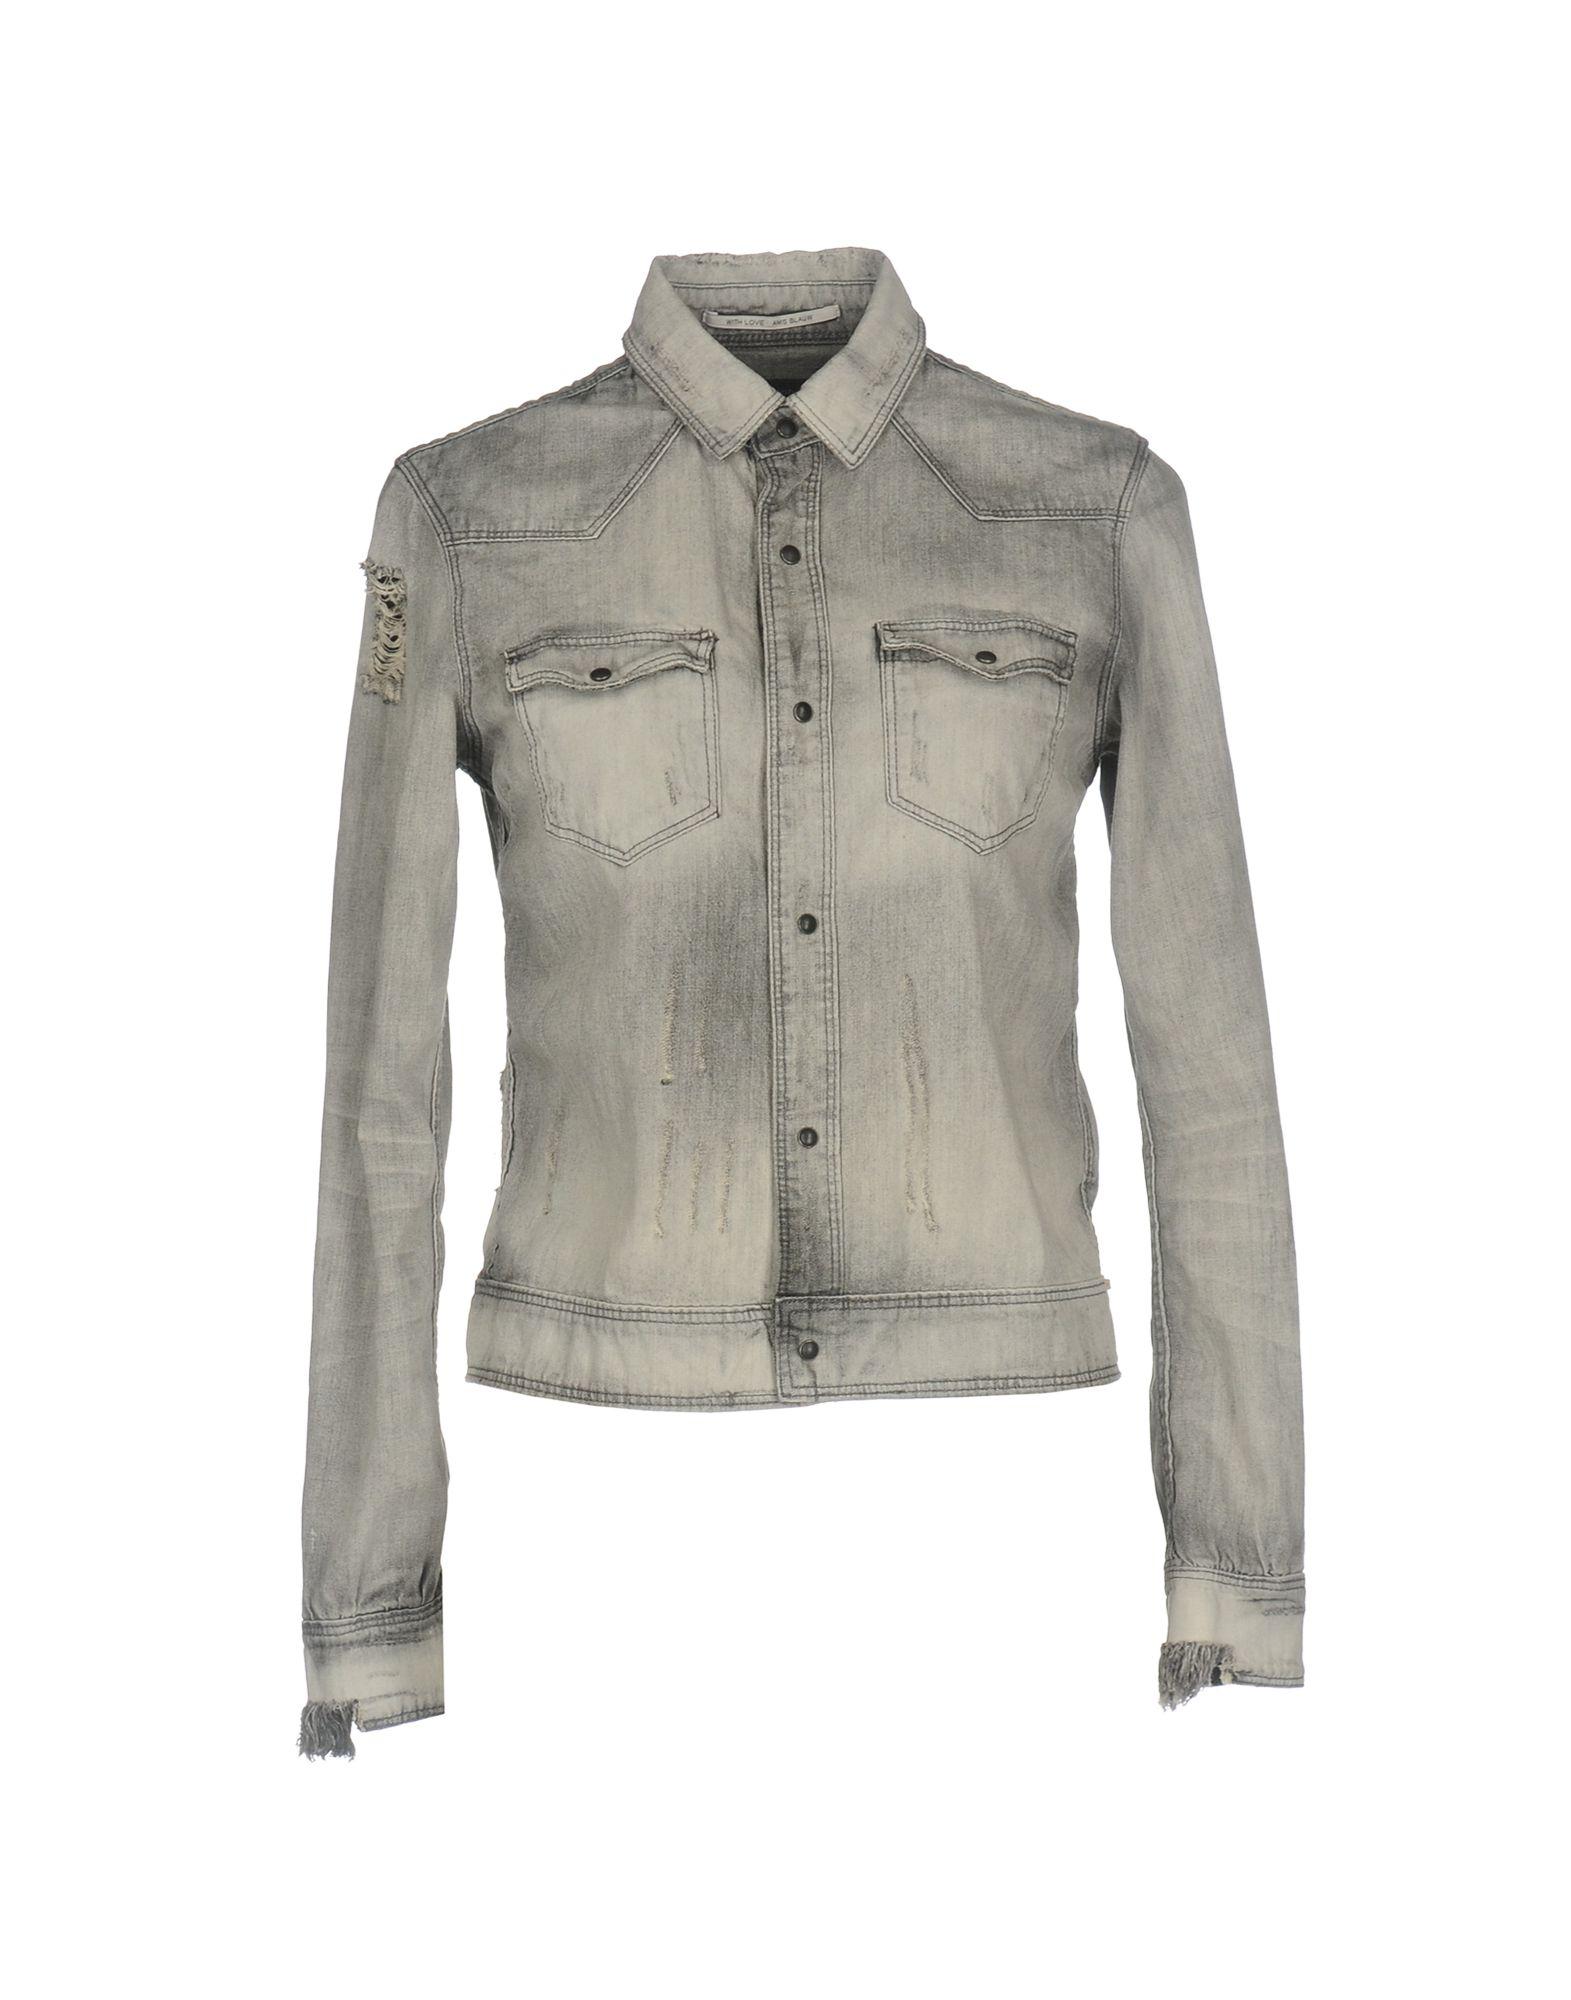 MAISON SCOTCH Джинсовая рубашка maison scotch рубашка maison scotch 133 1621 0120131137 03